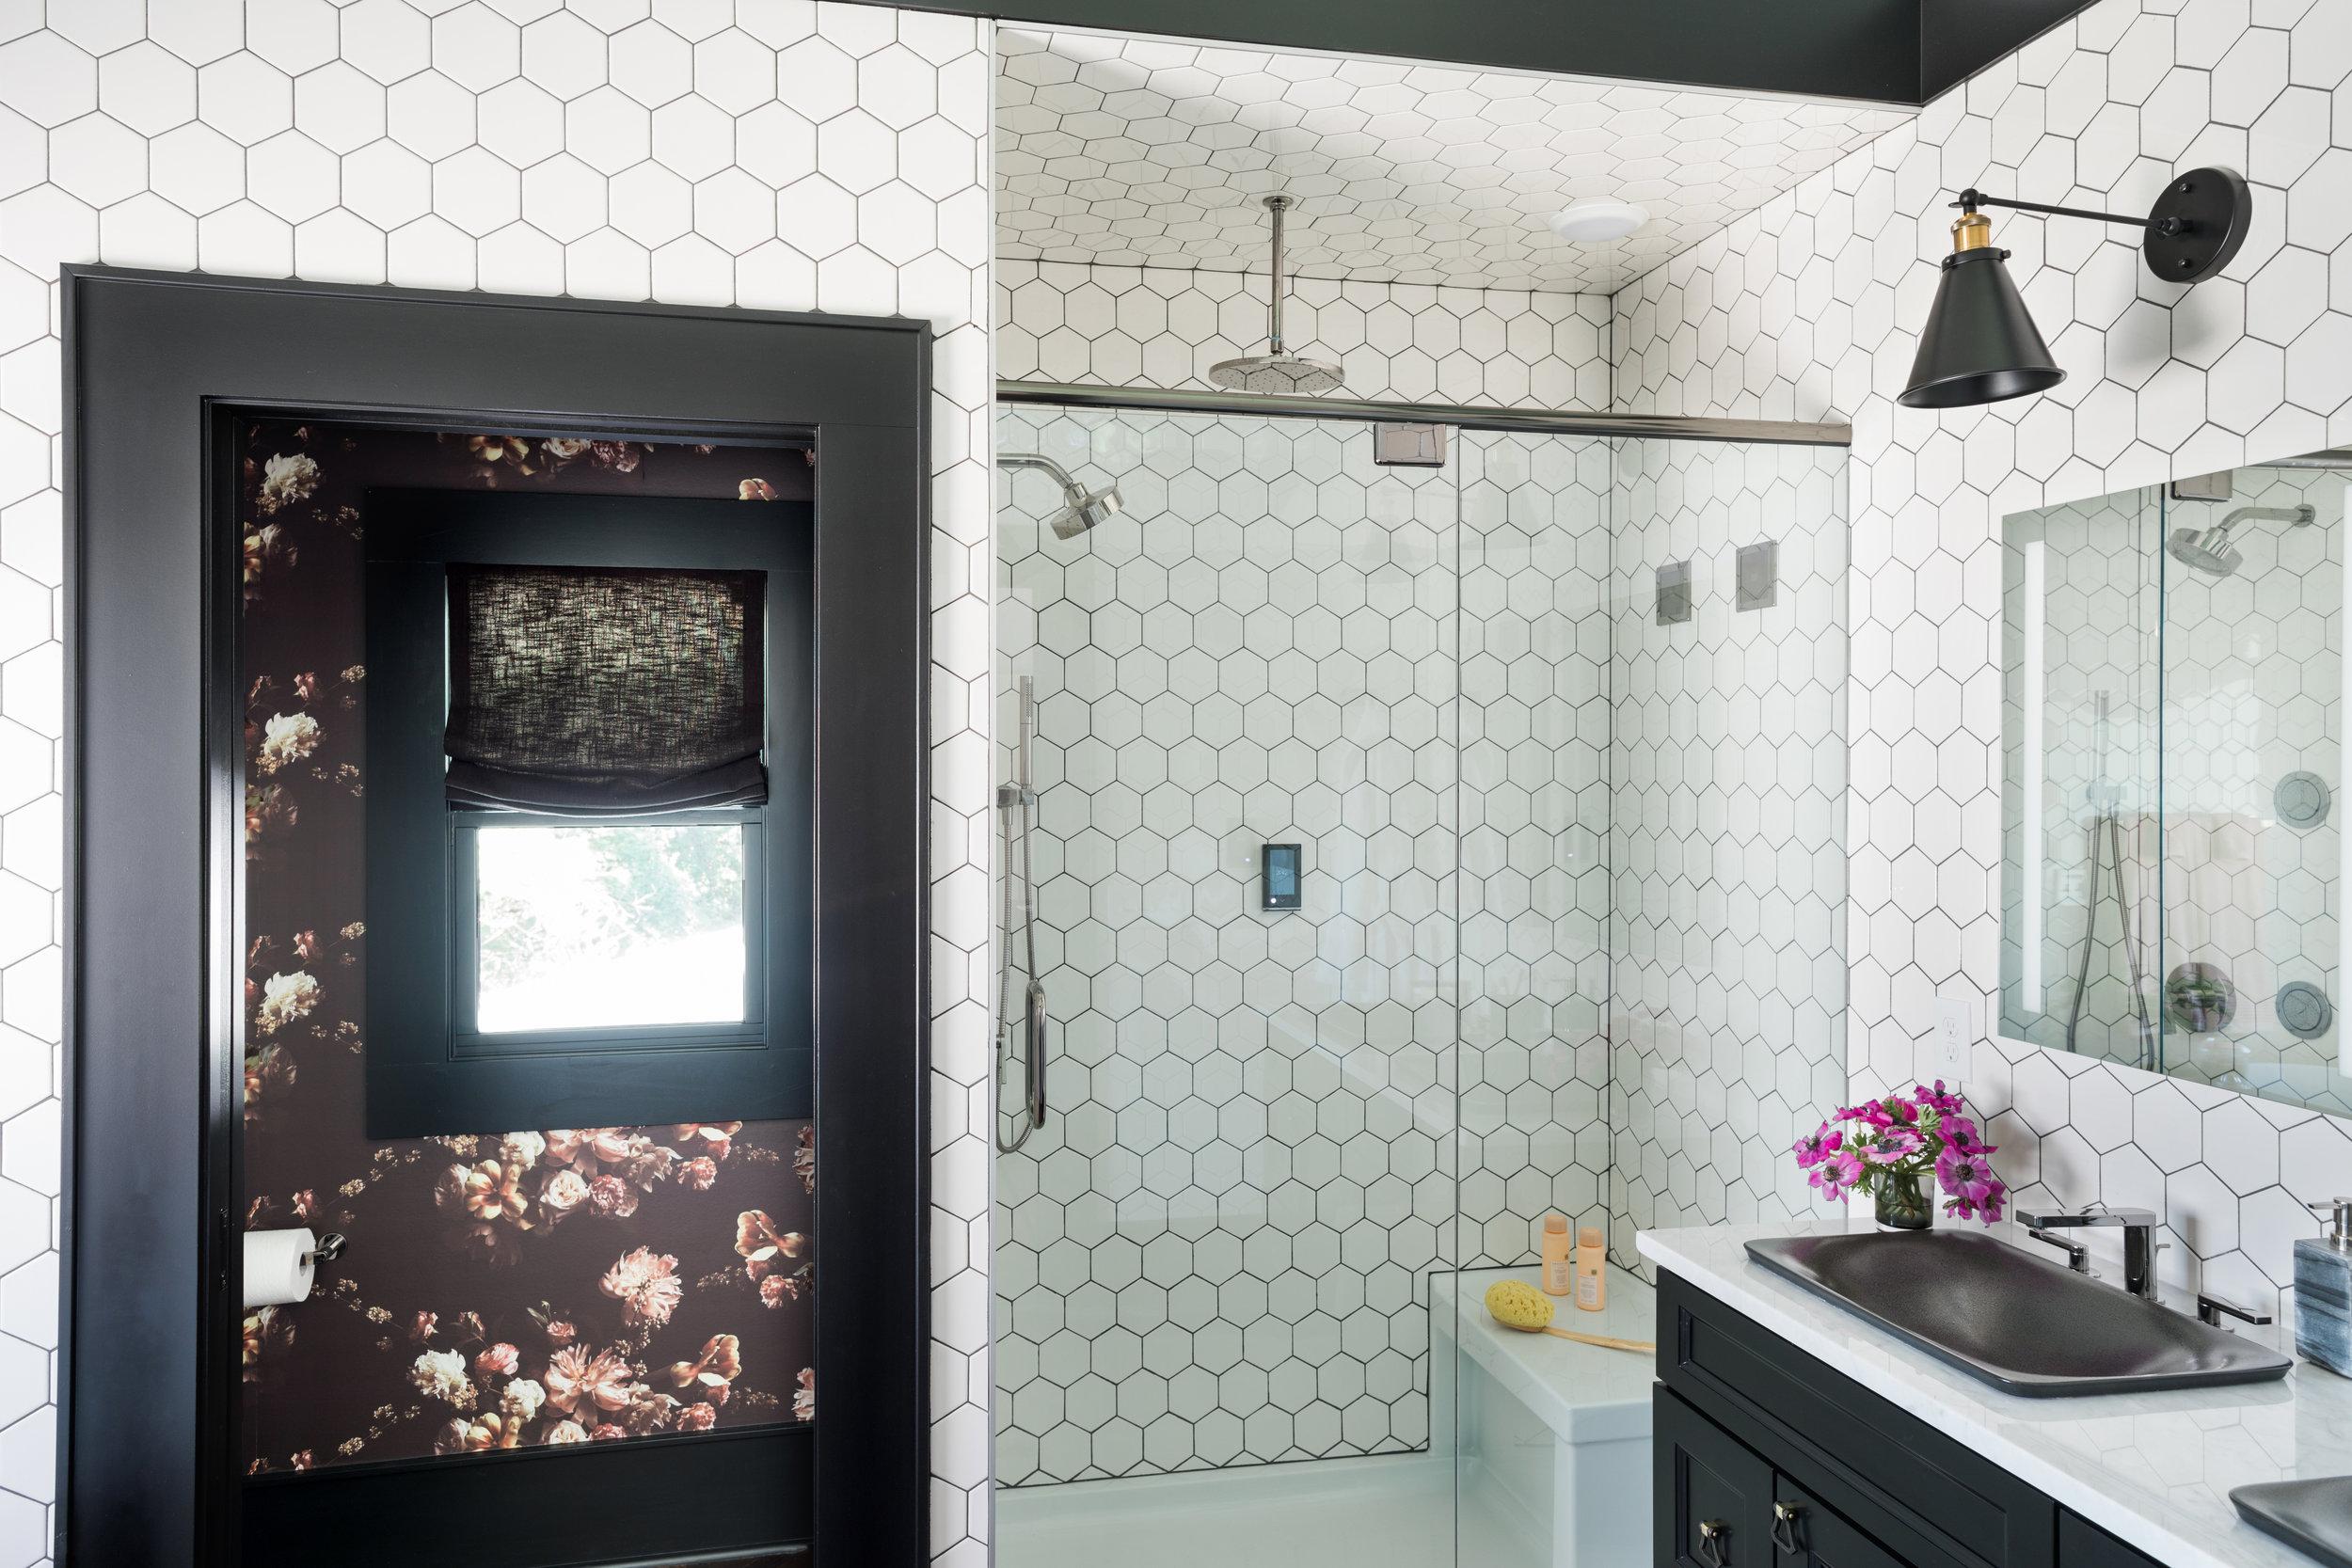 HGTV Urban Oasis 2017 - Master Bathroom with Shower.jpg